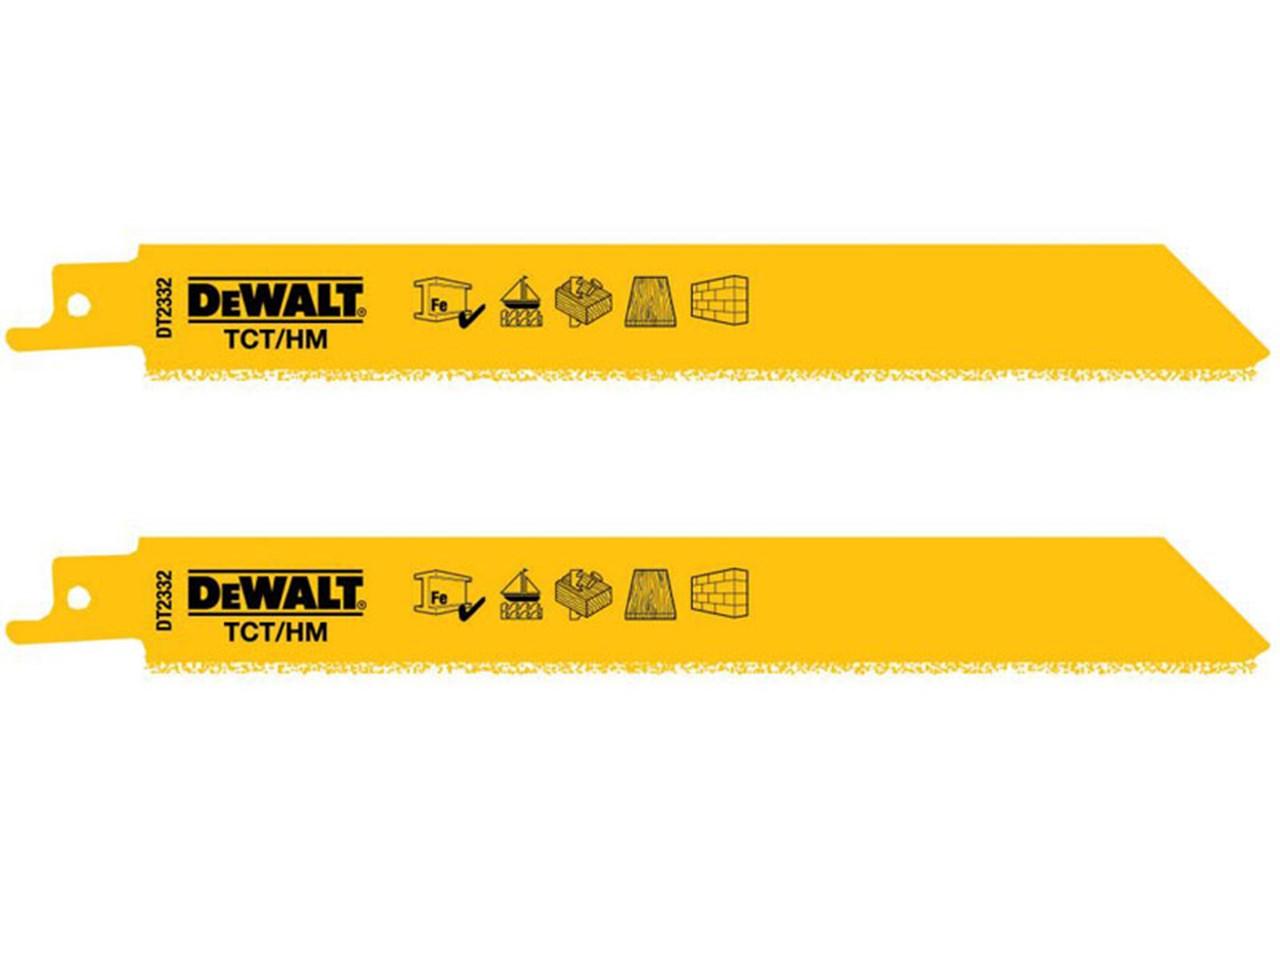 Dewalt dt2332 qz pack of 2 152mm tct grit recip saw blades keyboard keysfo Gallery